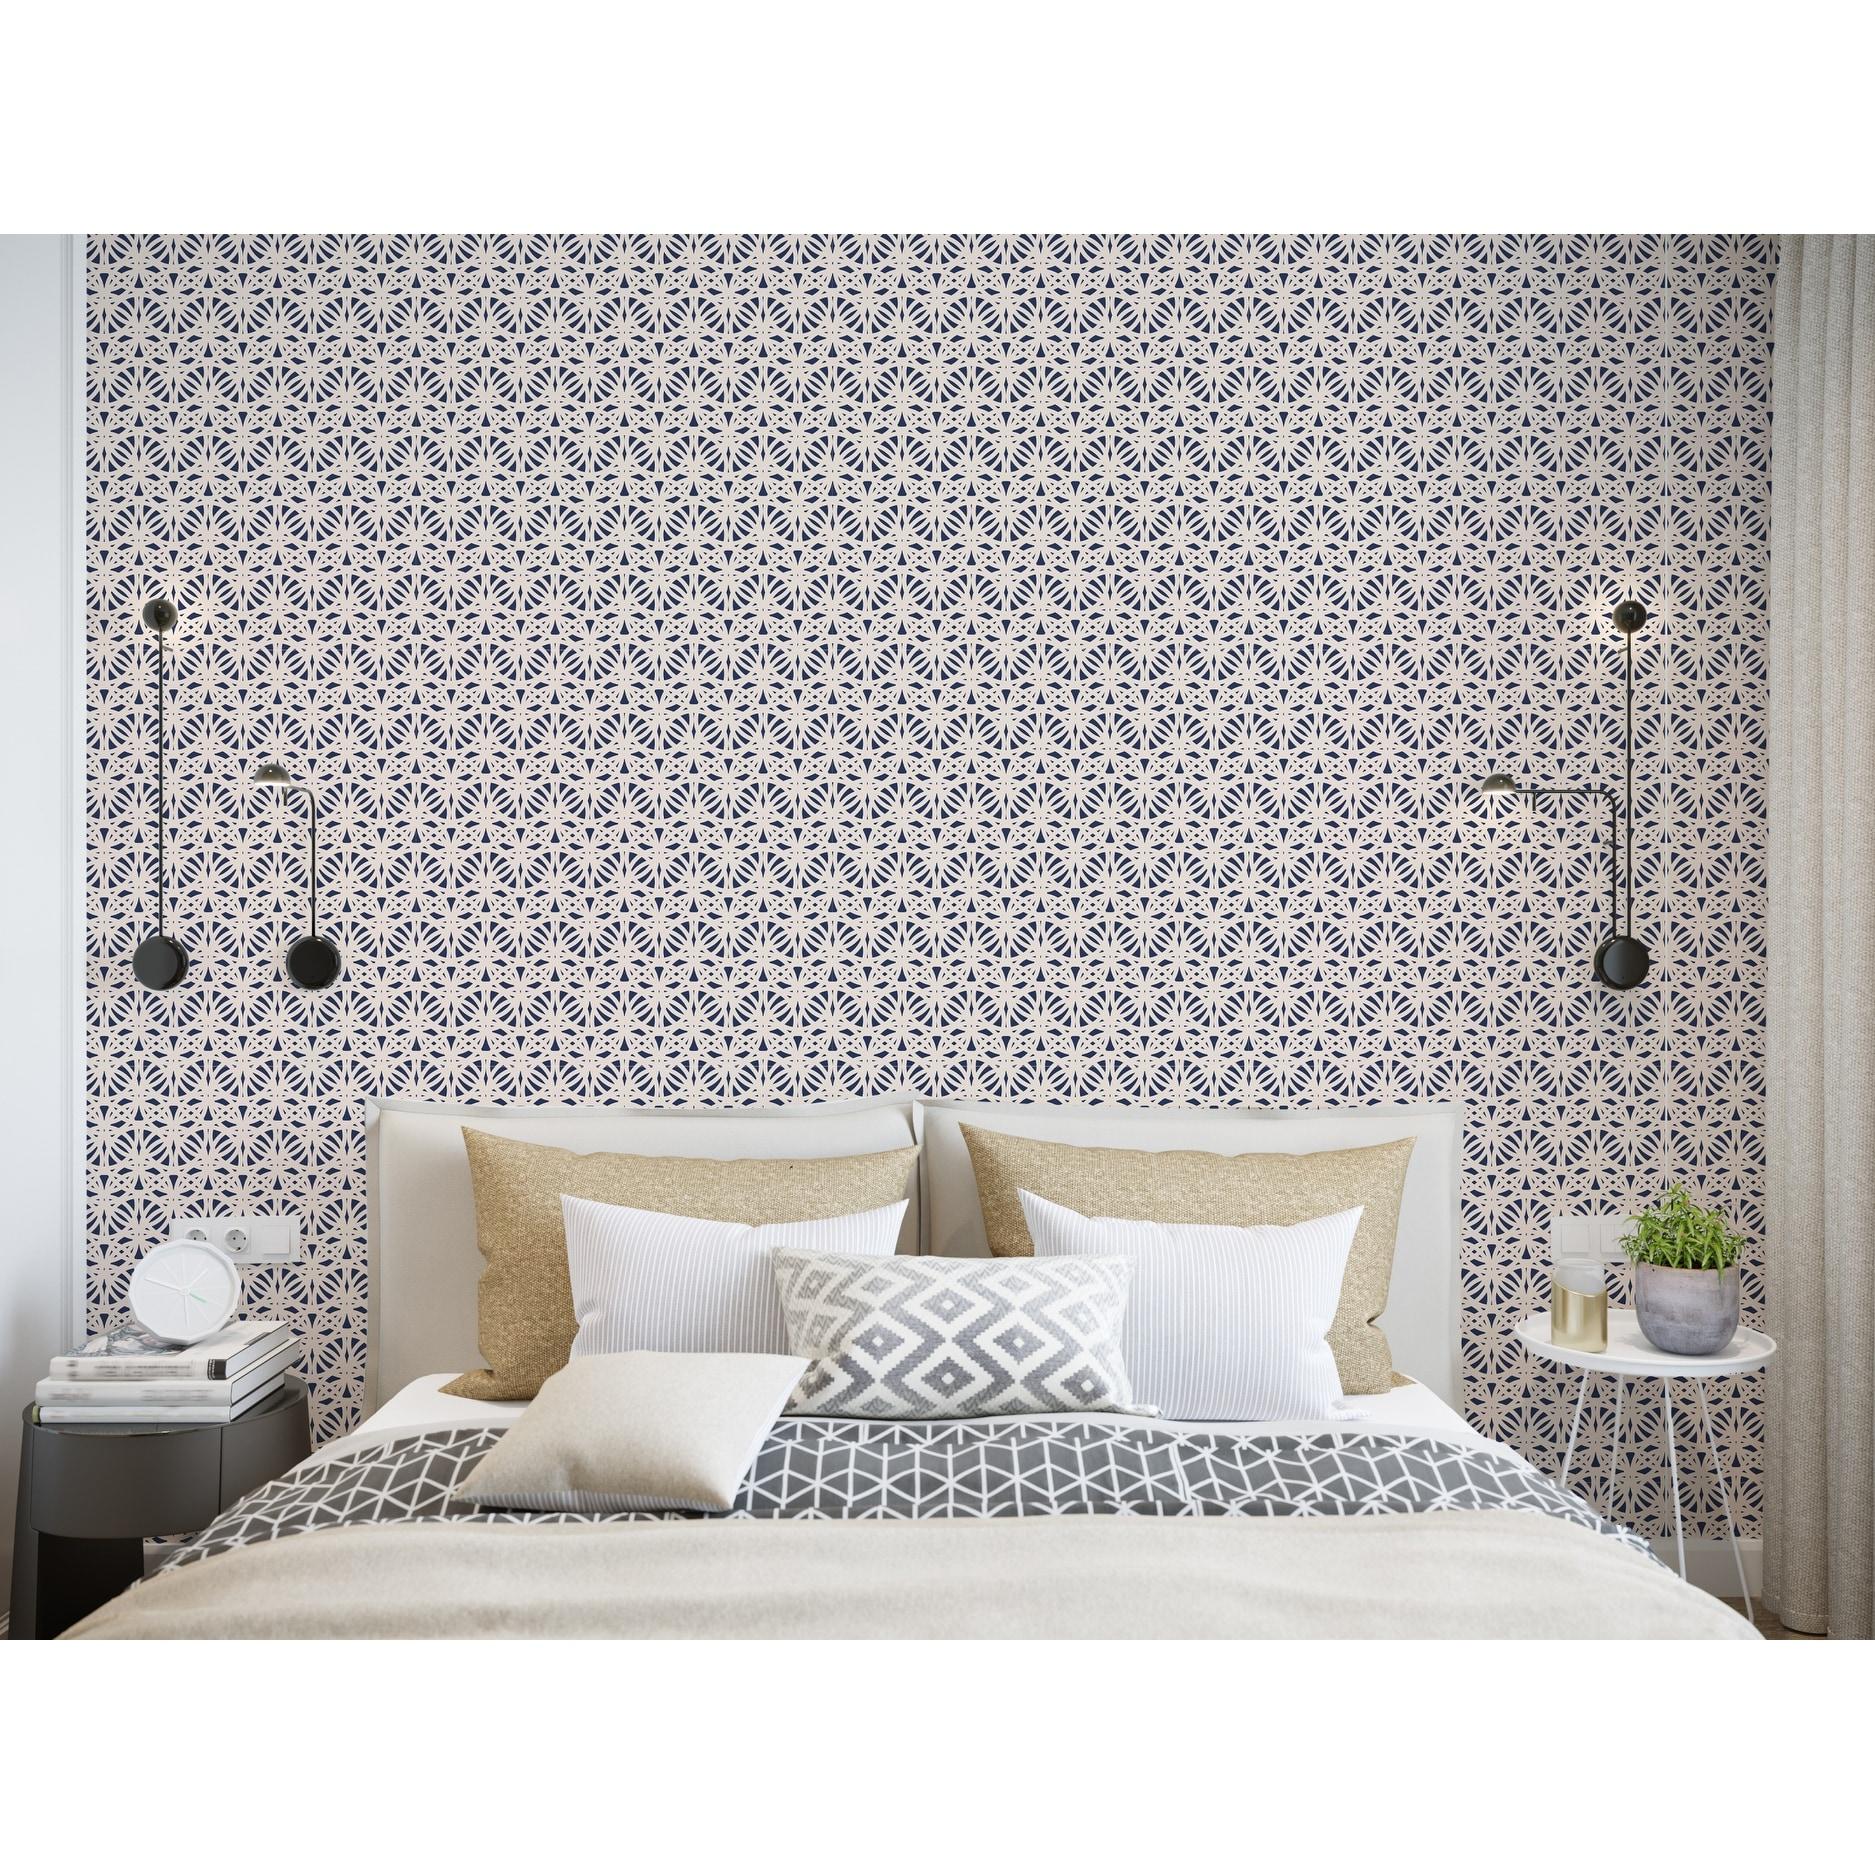 Shop Sbc Decor Egyptian Cotton Removable Peel Stick Vinyl Wallpaper Panel Overstock 32029295